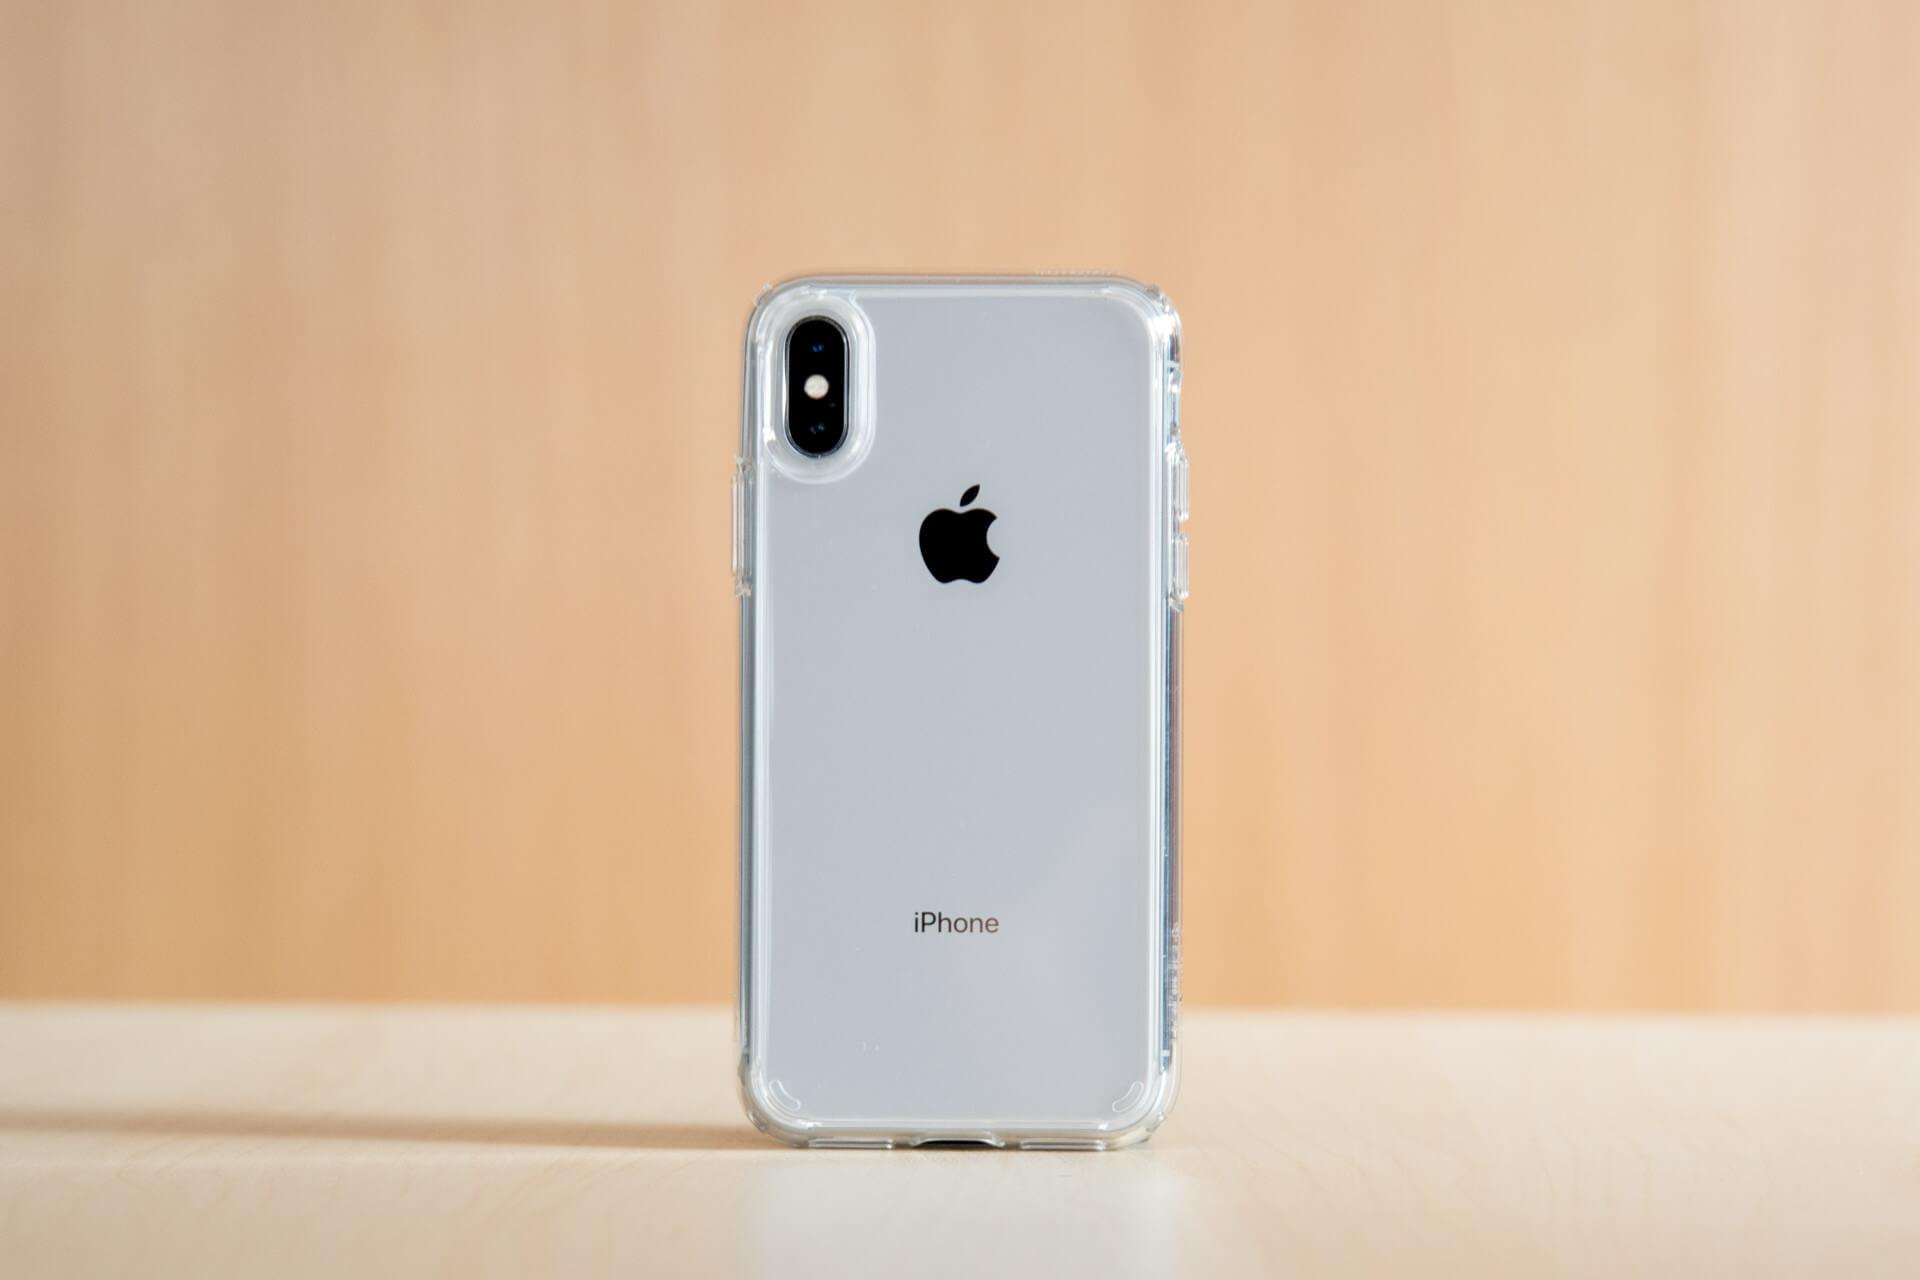 Spigen iPhone X ケース ウルトラ・ハイブリッド 11